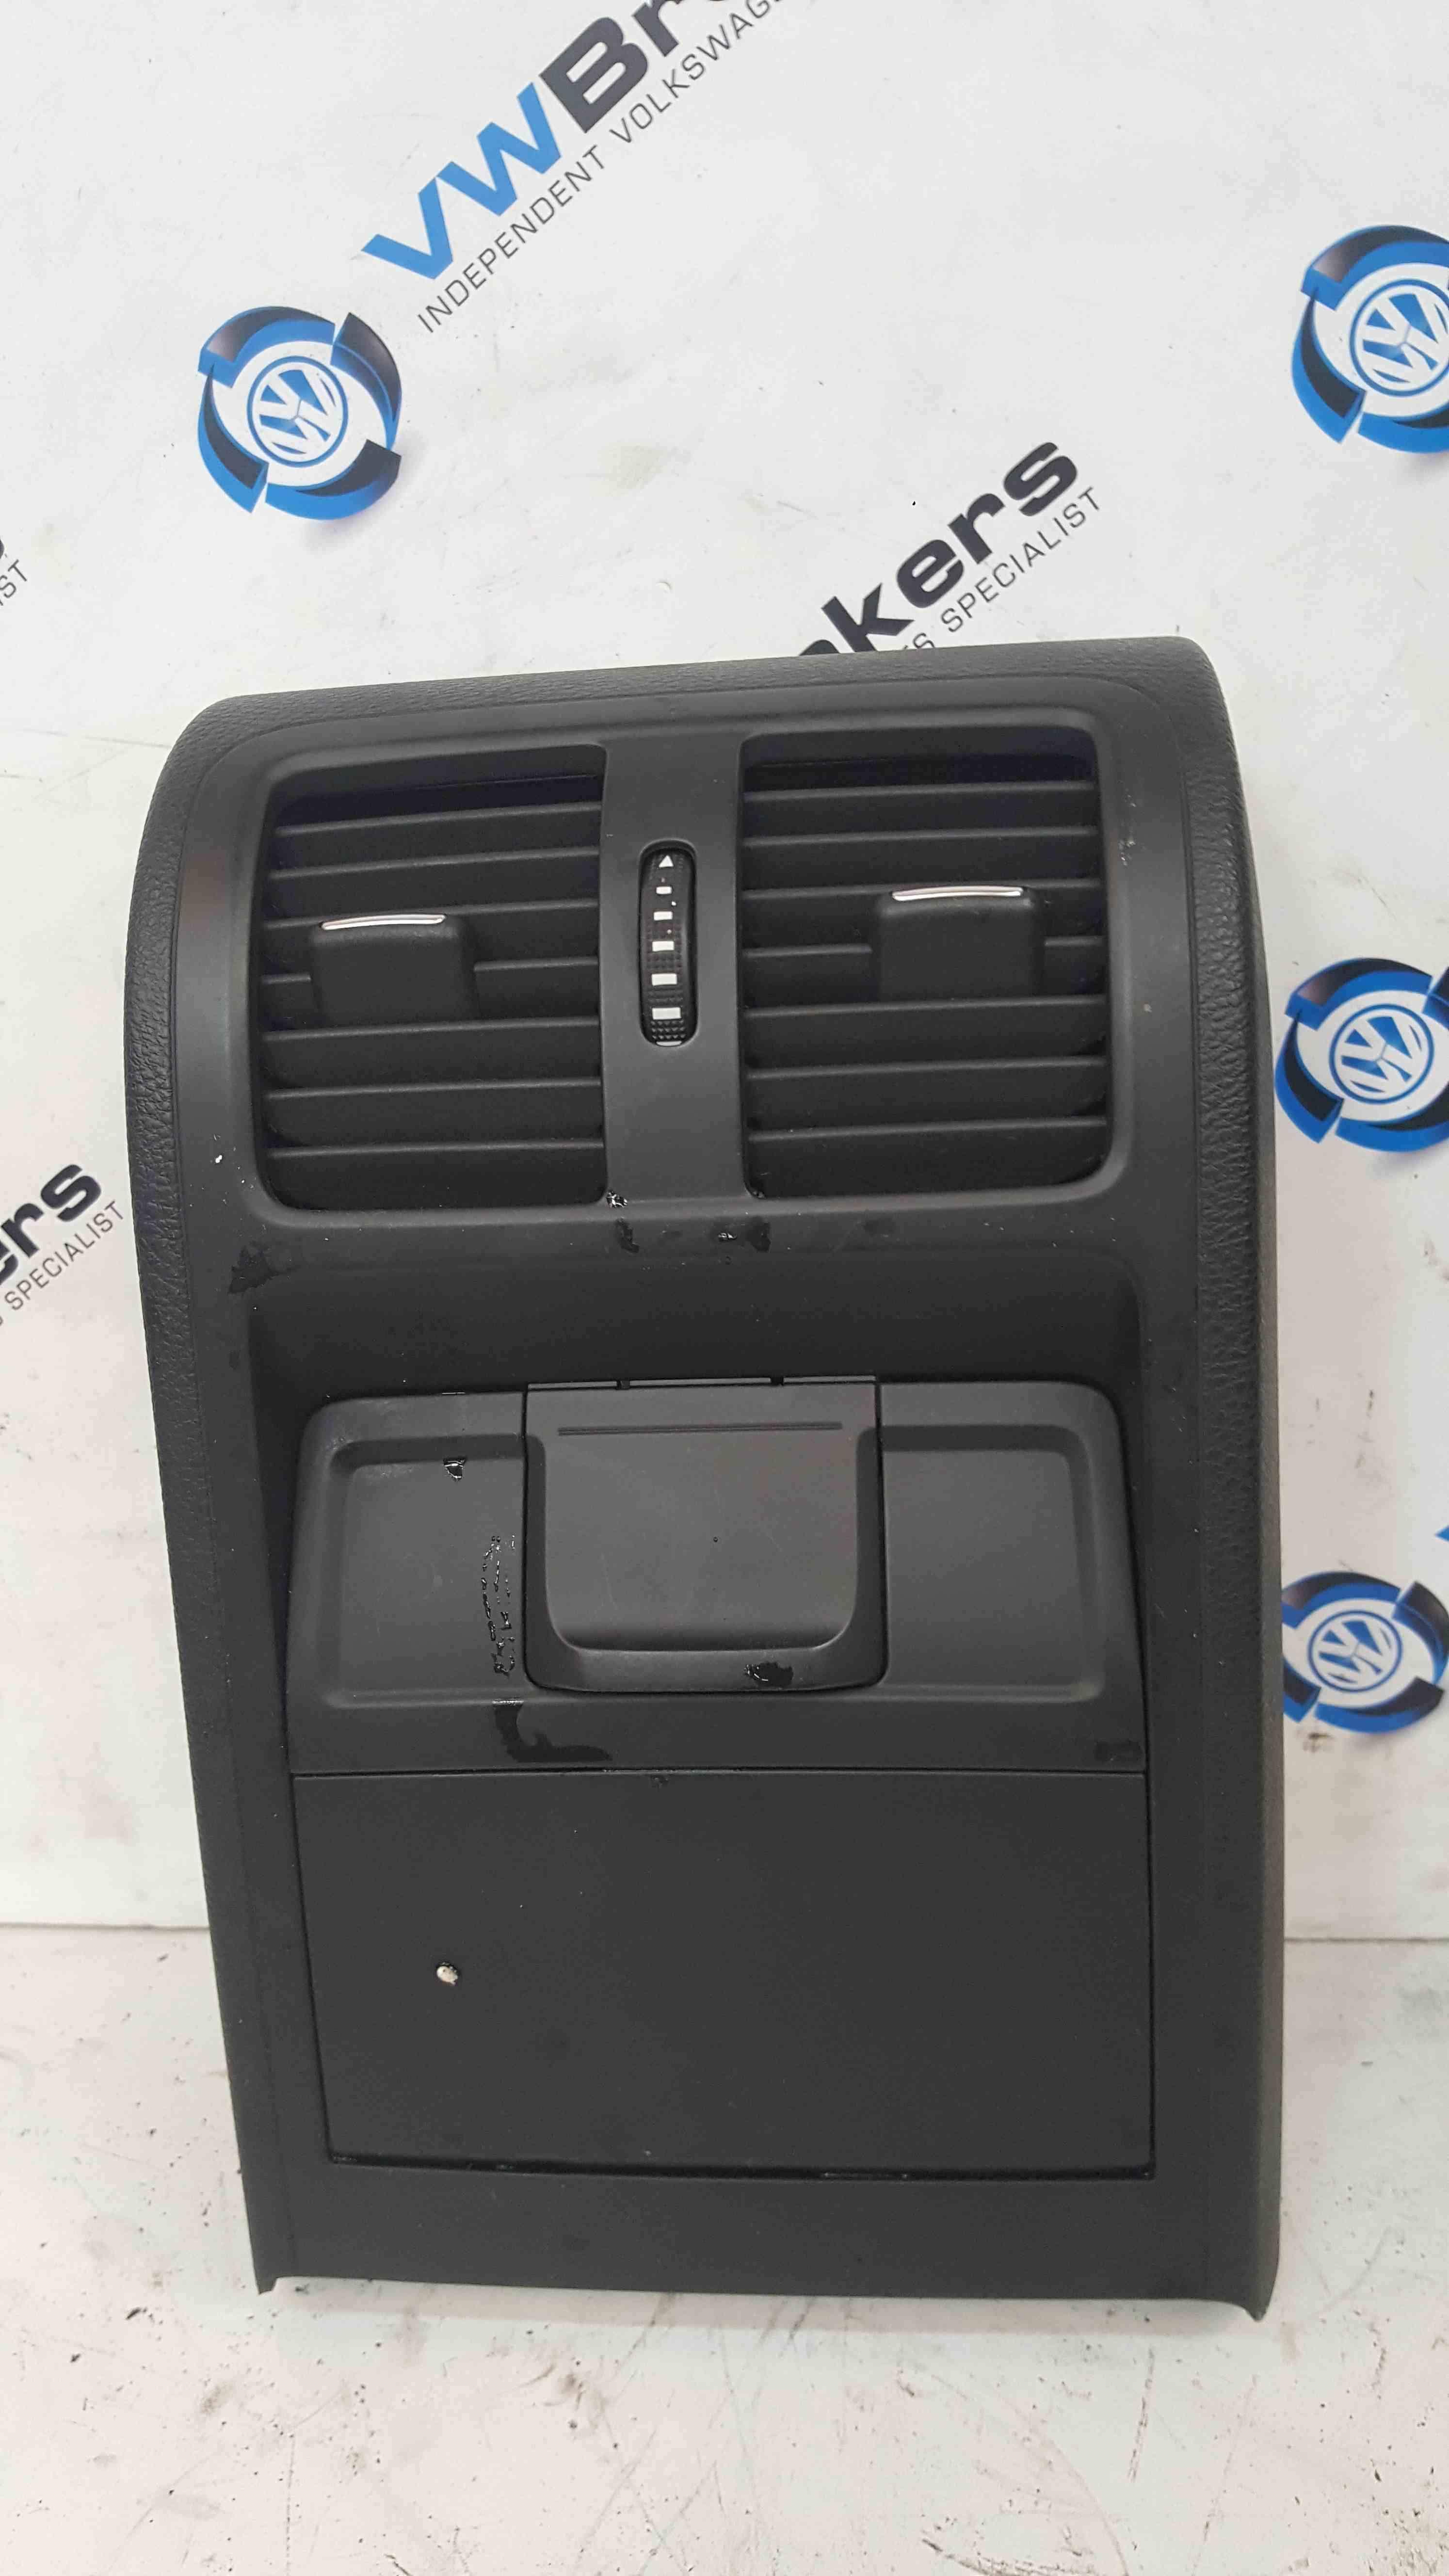 Volkswagen Passat B7 2010-2015 Centre Heater Vent Cigarette Lighter 3AA864298